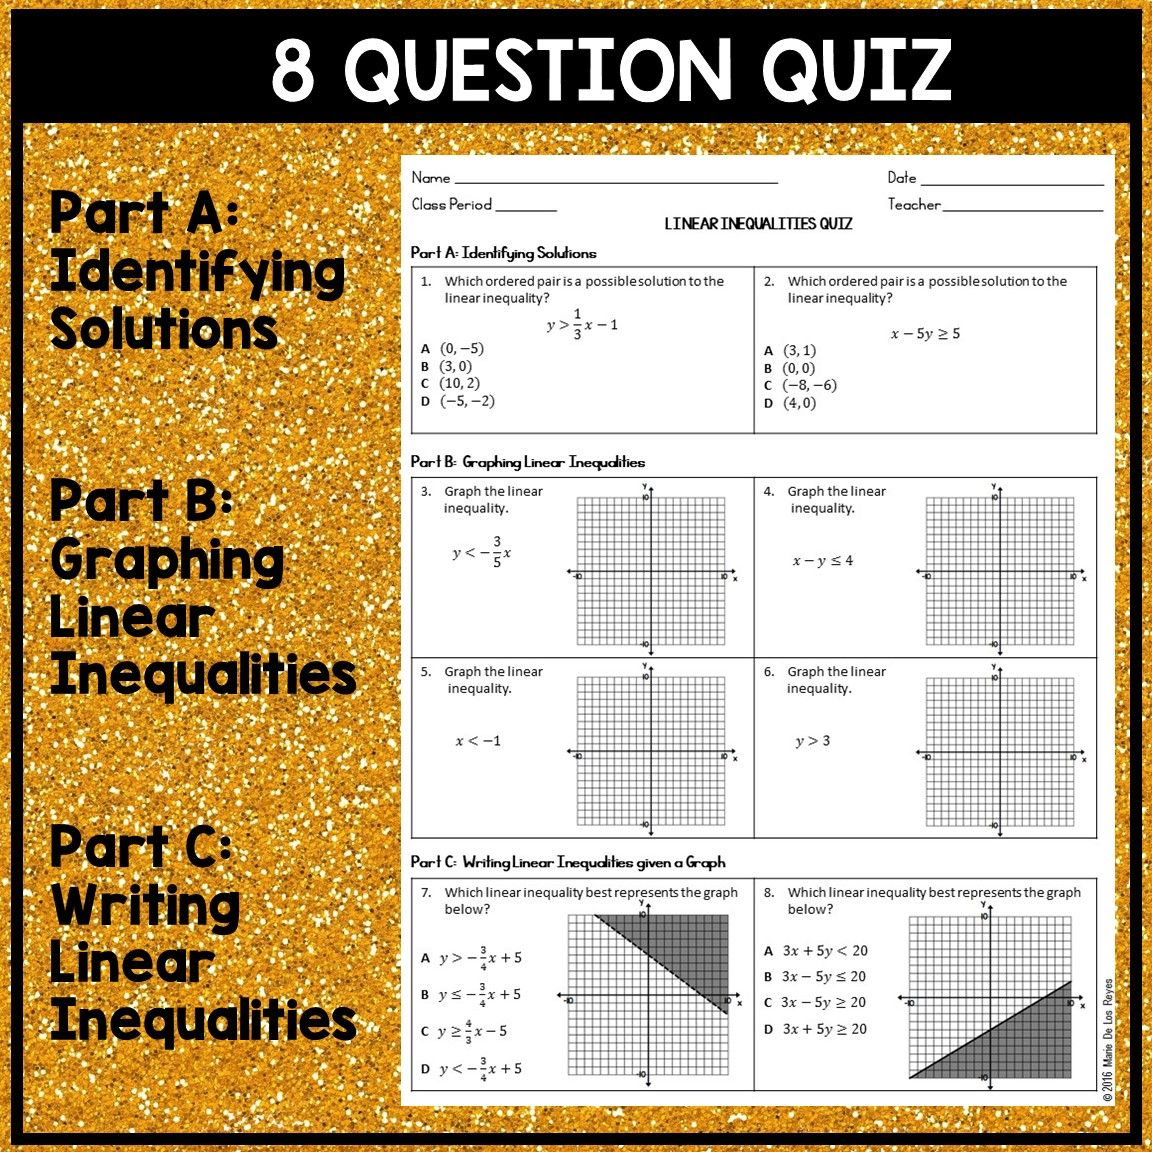 Linear inequalities quiz linear inequalities graphing